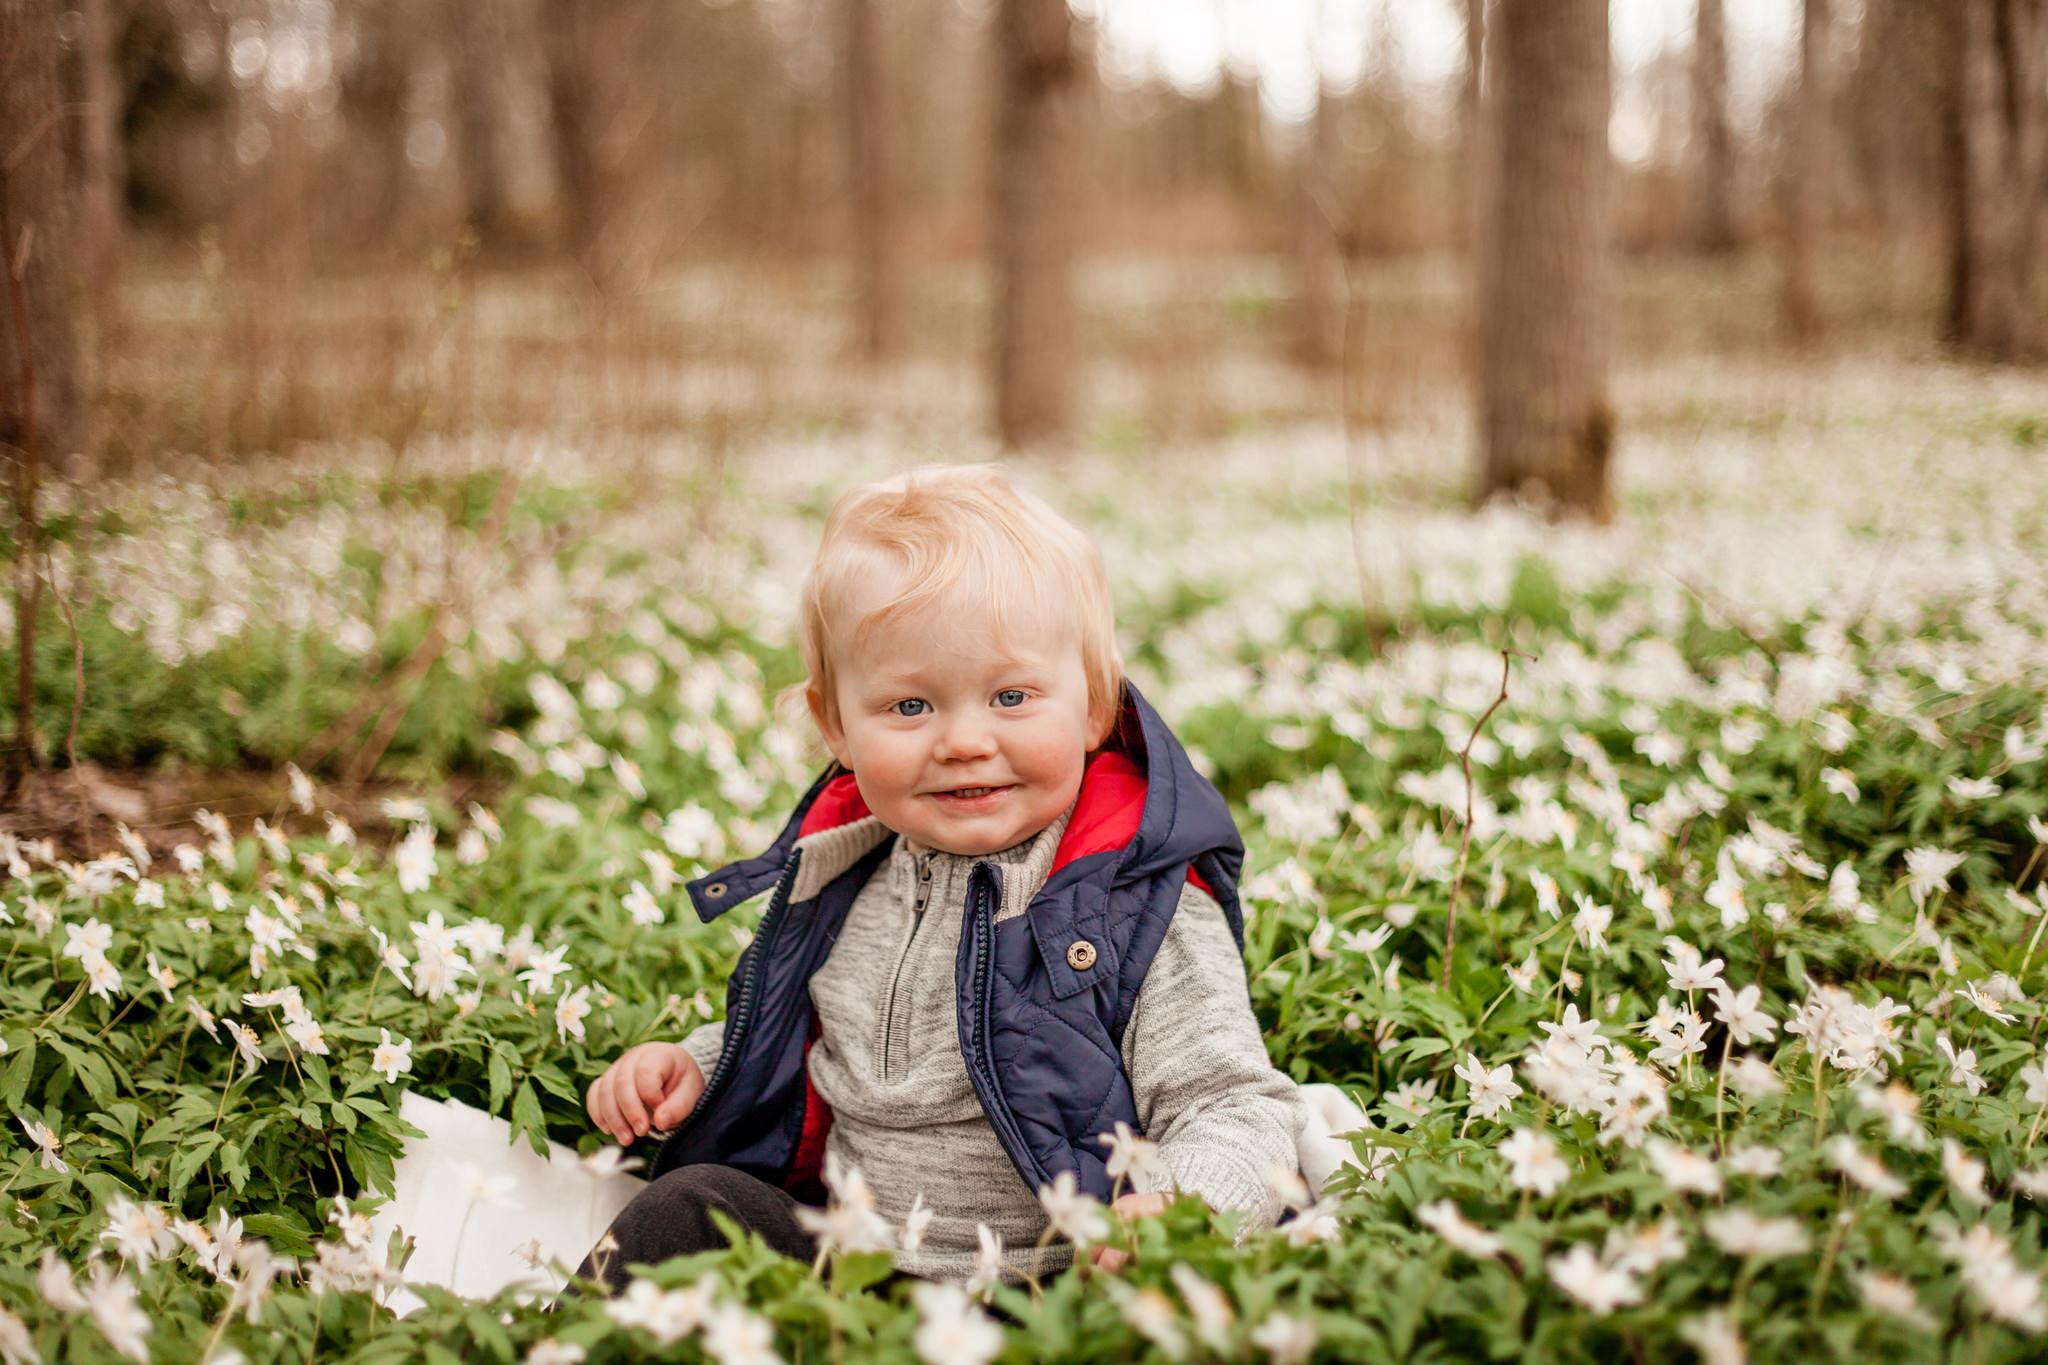 barnfotograf-familjefotograf-barnfotograf-fotograf-eksjo-mia-modigh-westlund-brollop-smaland-26